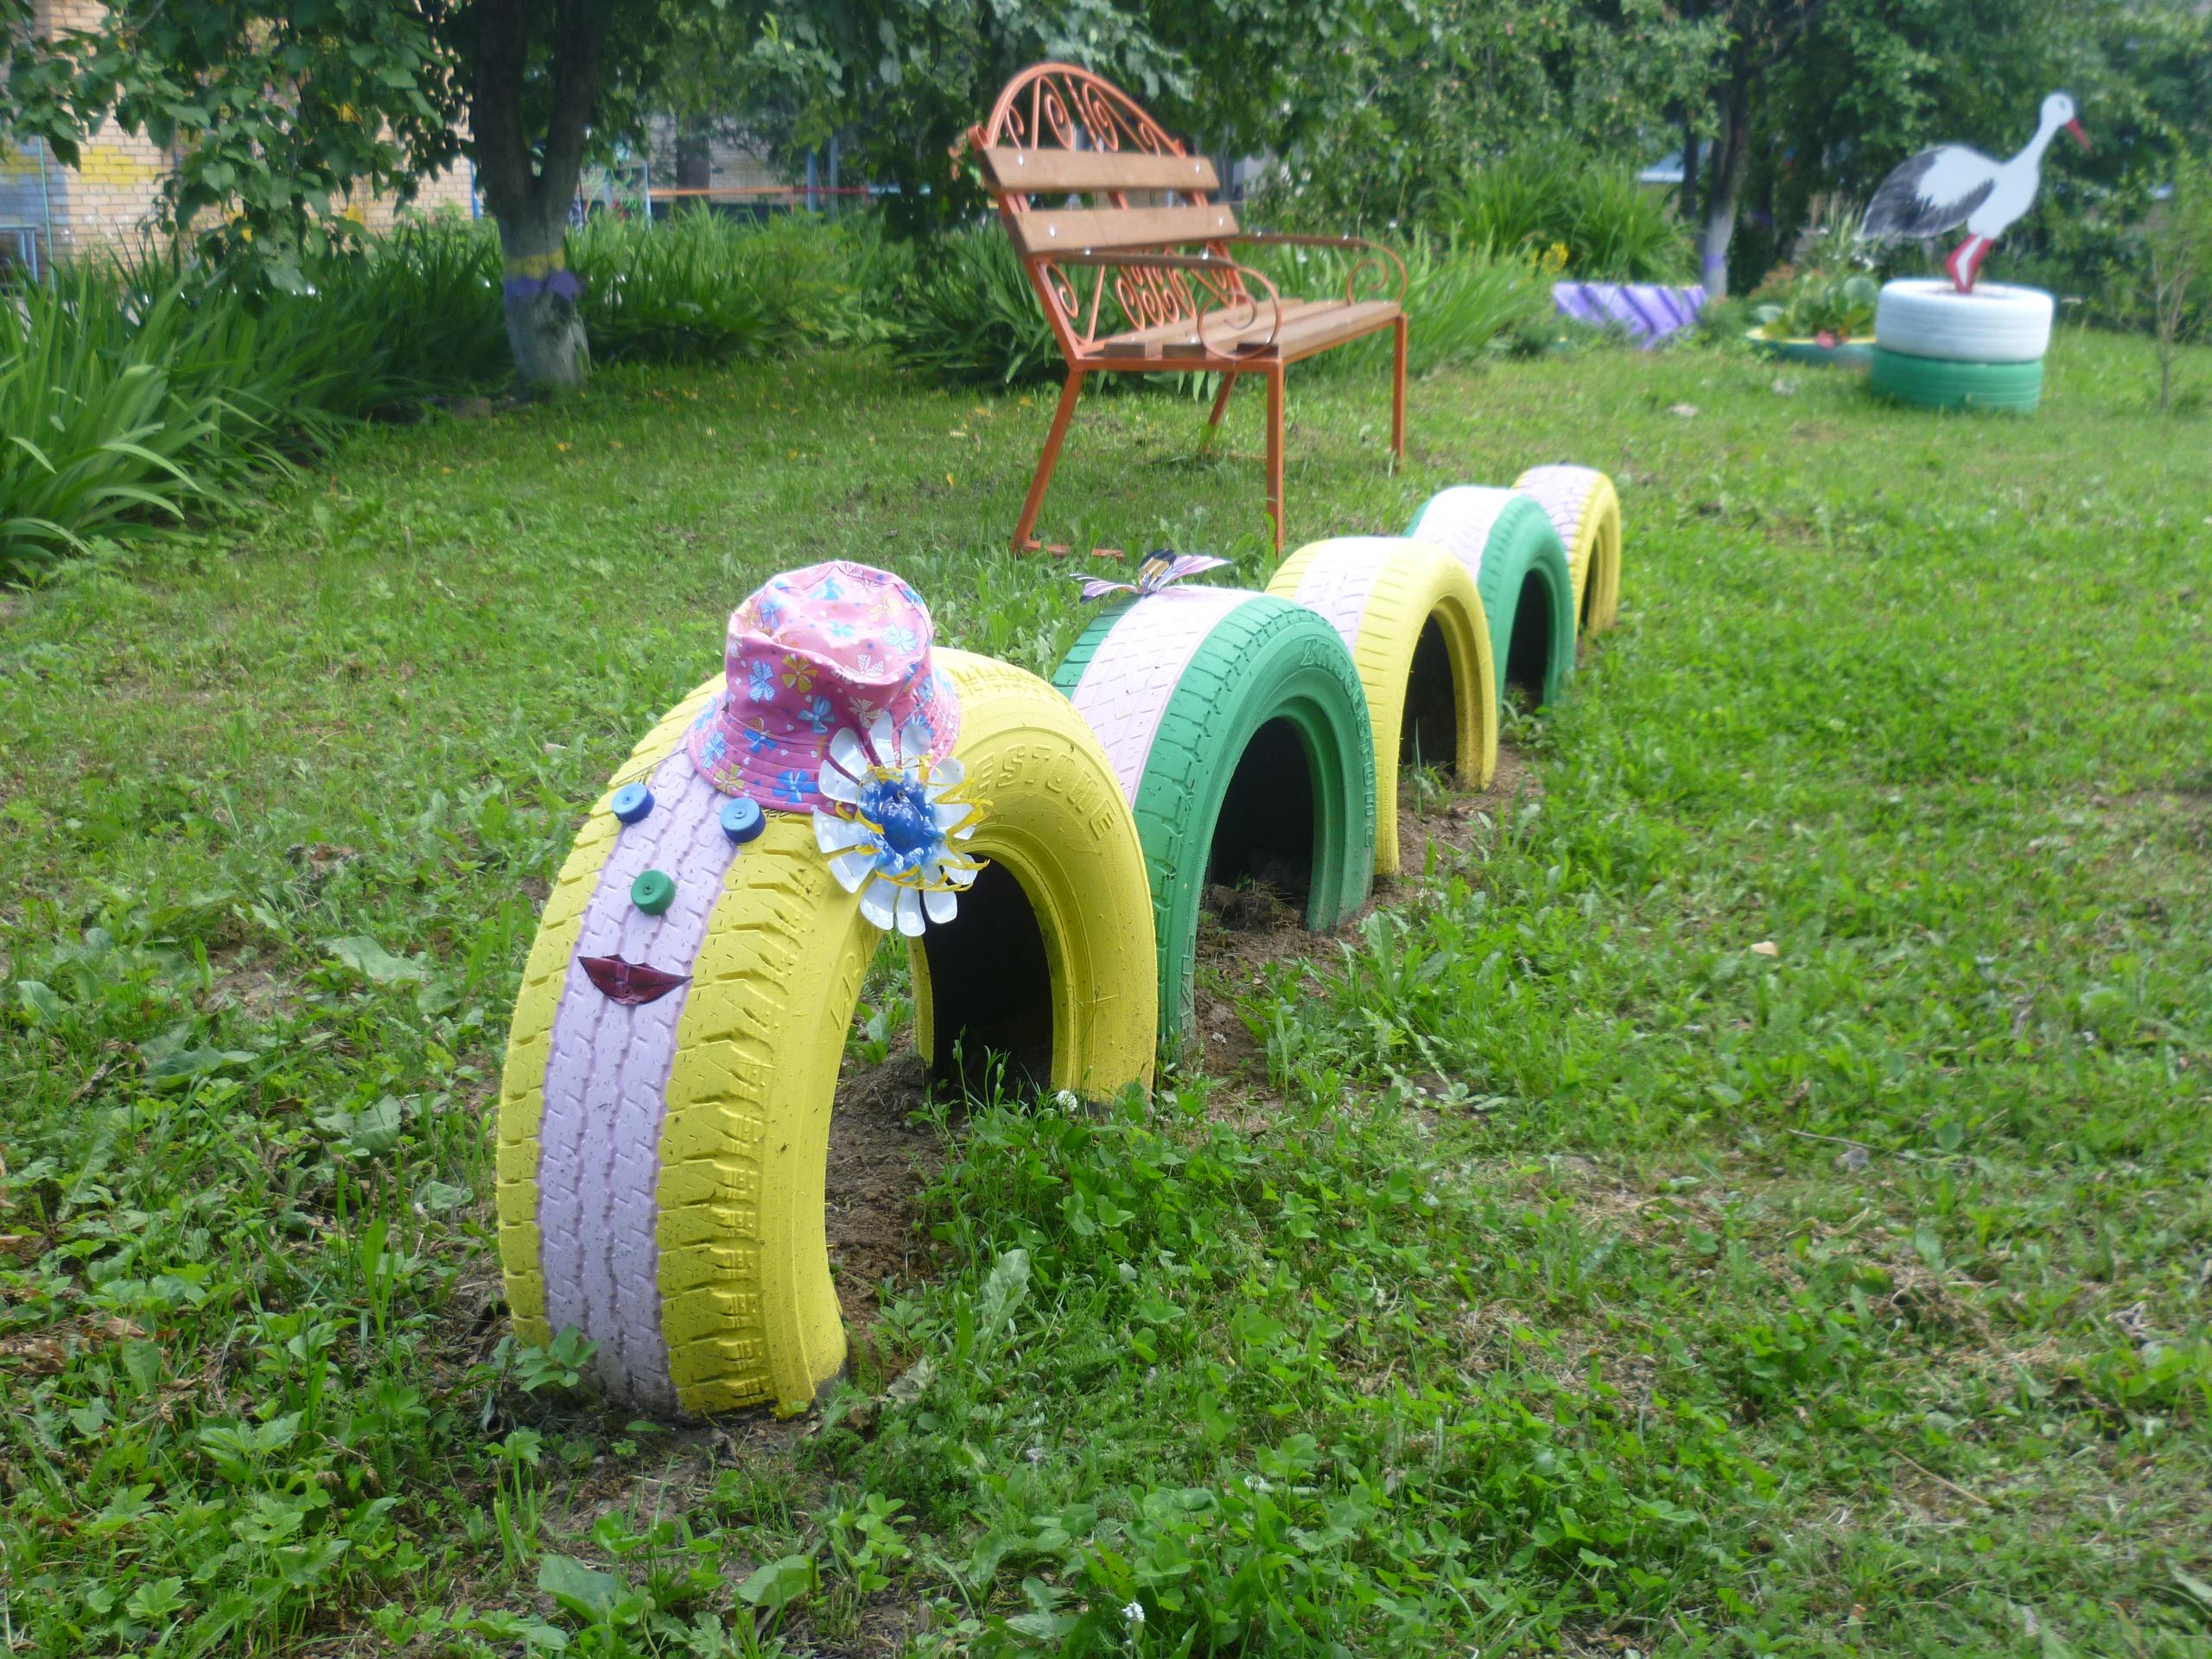 Гусеница для сада своими руками фото